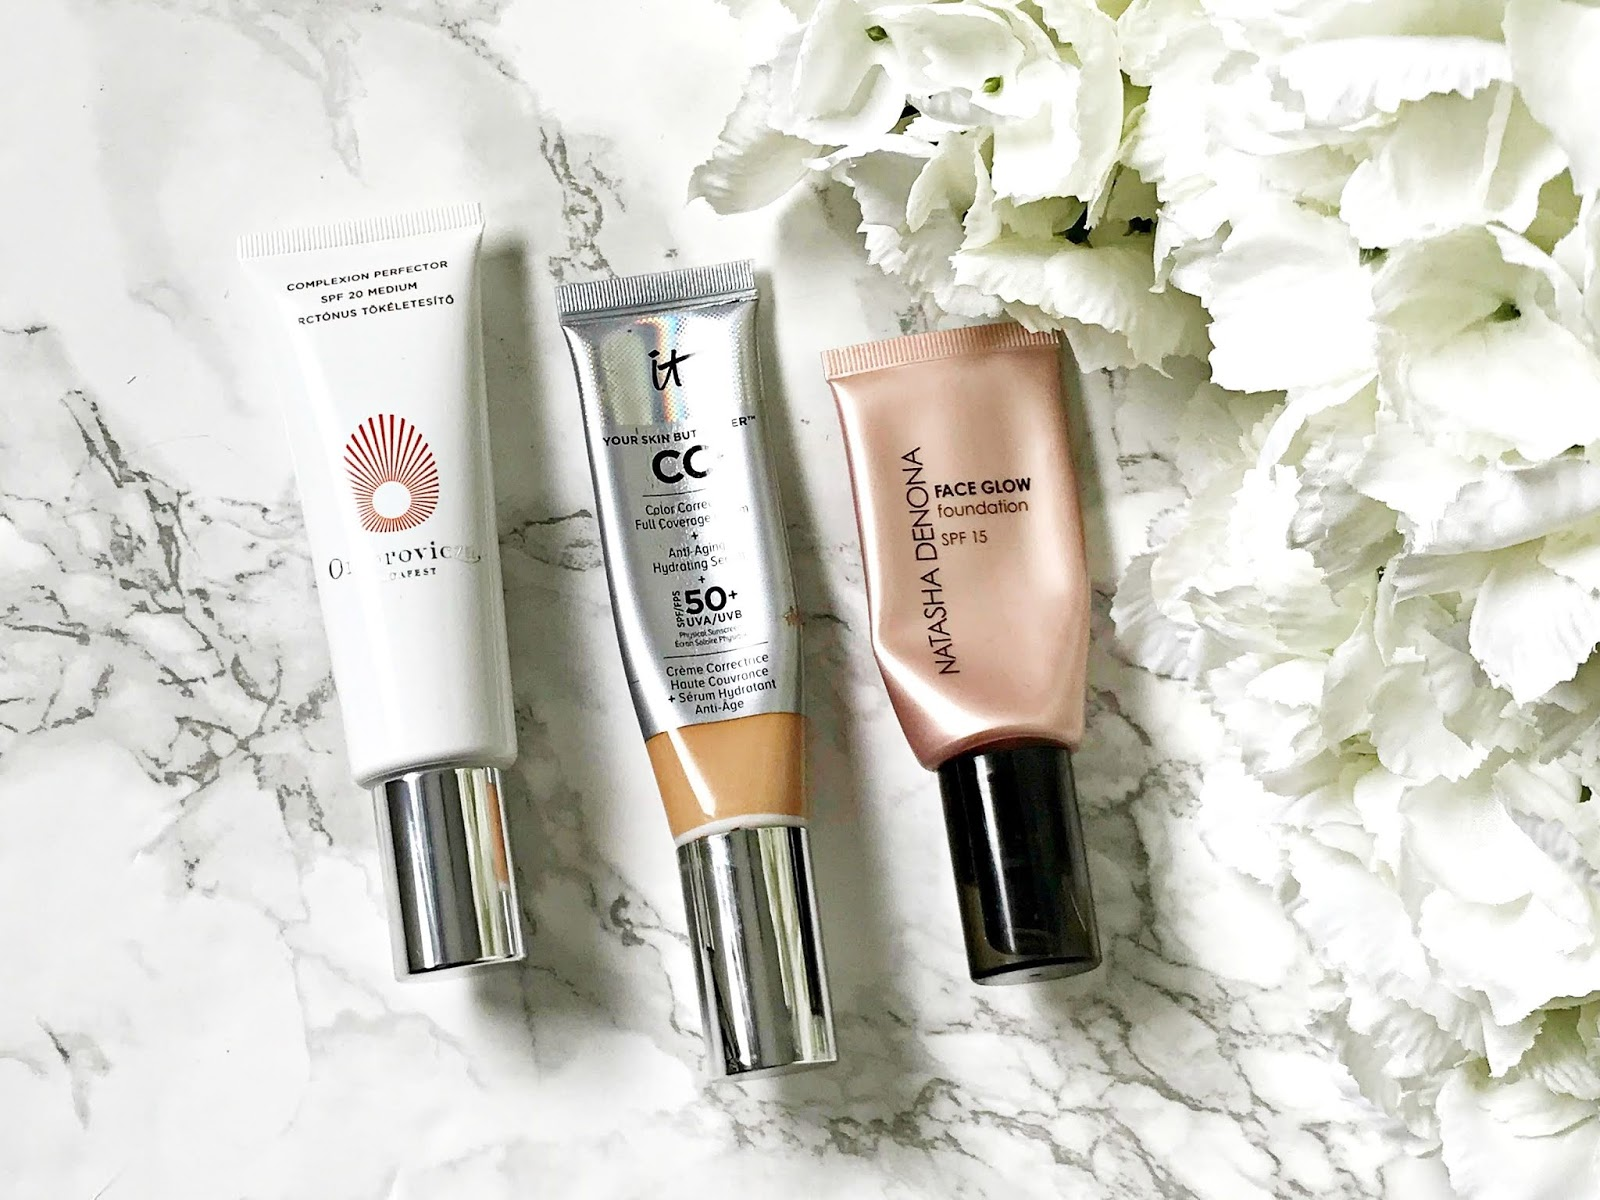 Omorovicza, Complexion Perfector review, It Cosmetics CC Cream review, Natasha Denona Face Glow review,